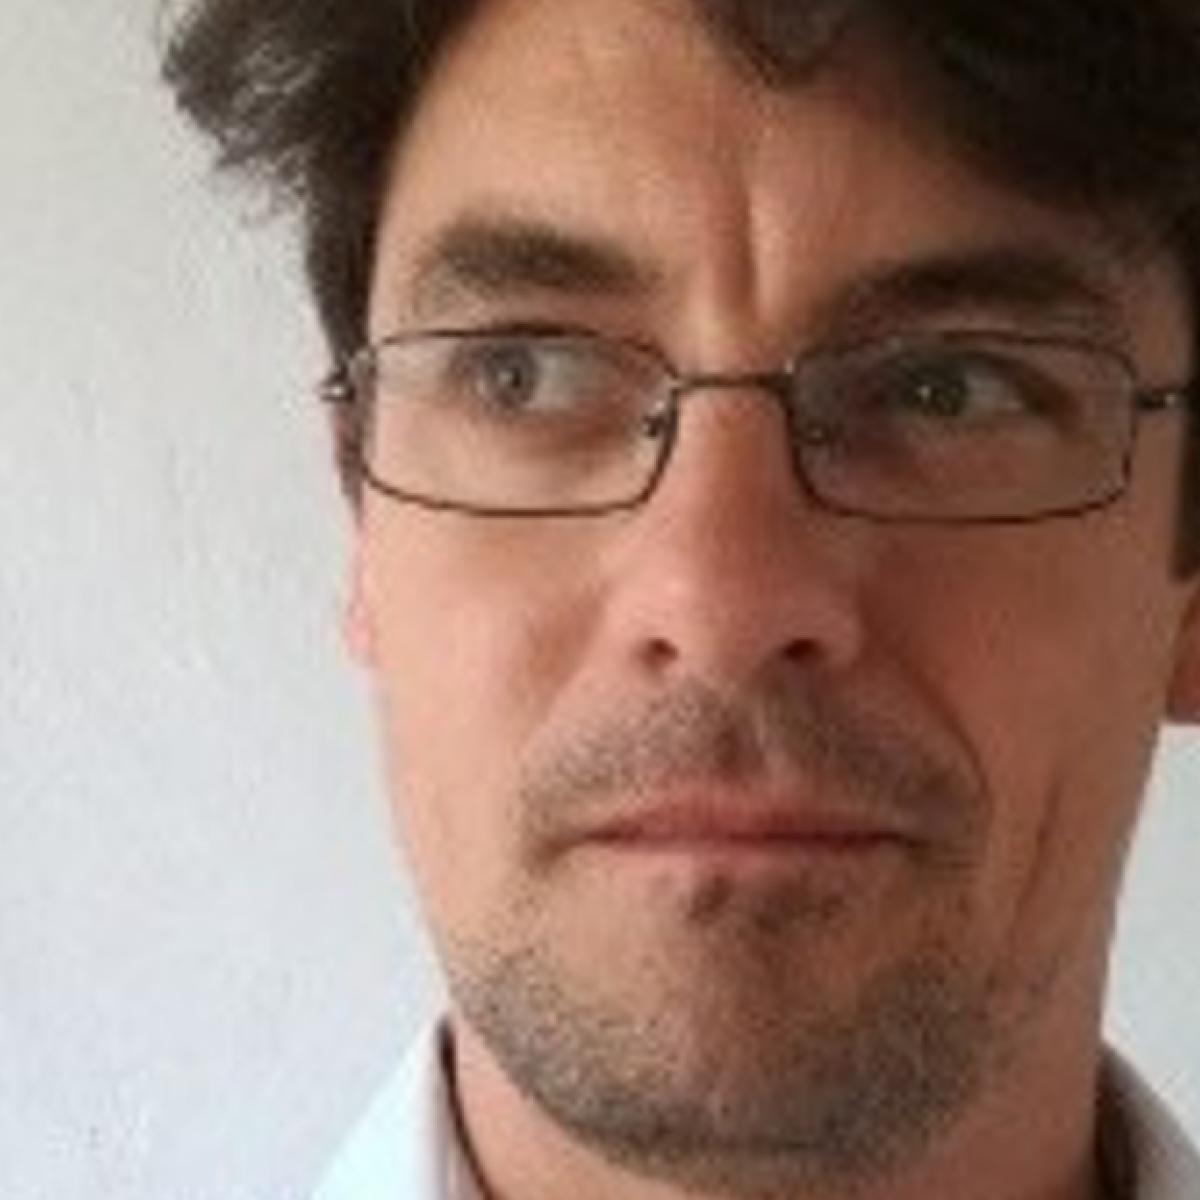 Sébastien Delmotte